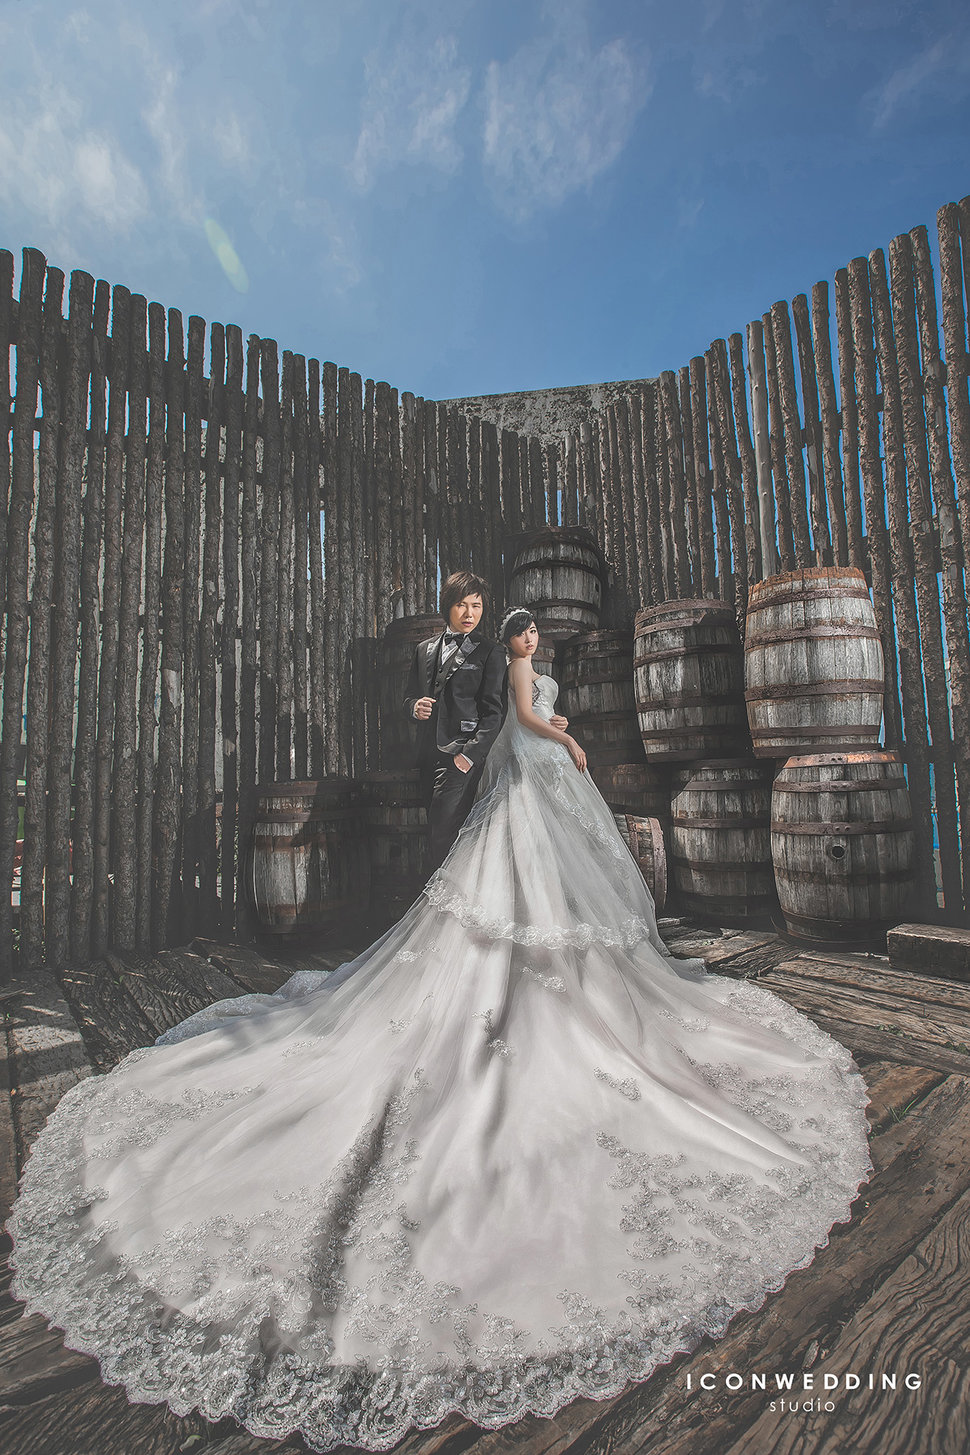 AD7X6697 - 愛情符號 ‧ 玩拍婚紗 ‧ 海外婚紗 - 結婚吧